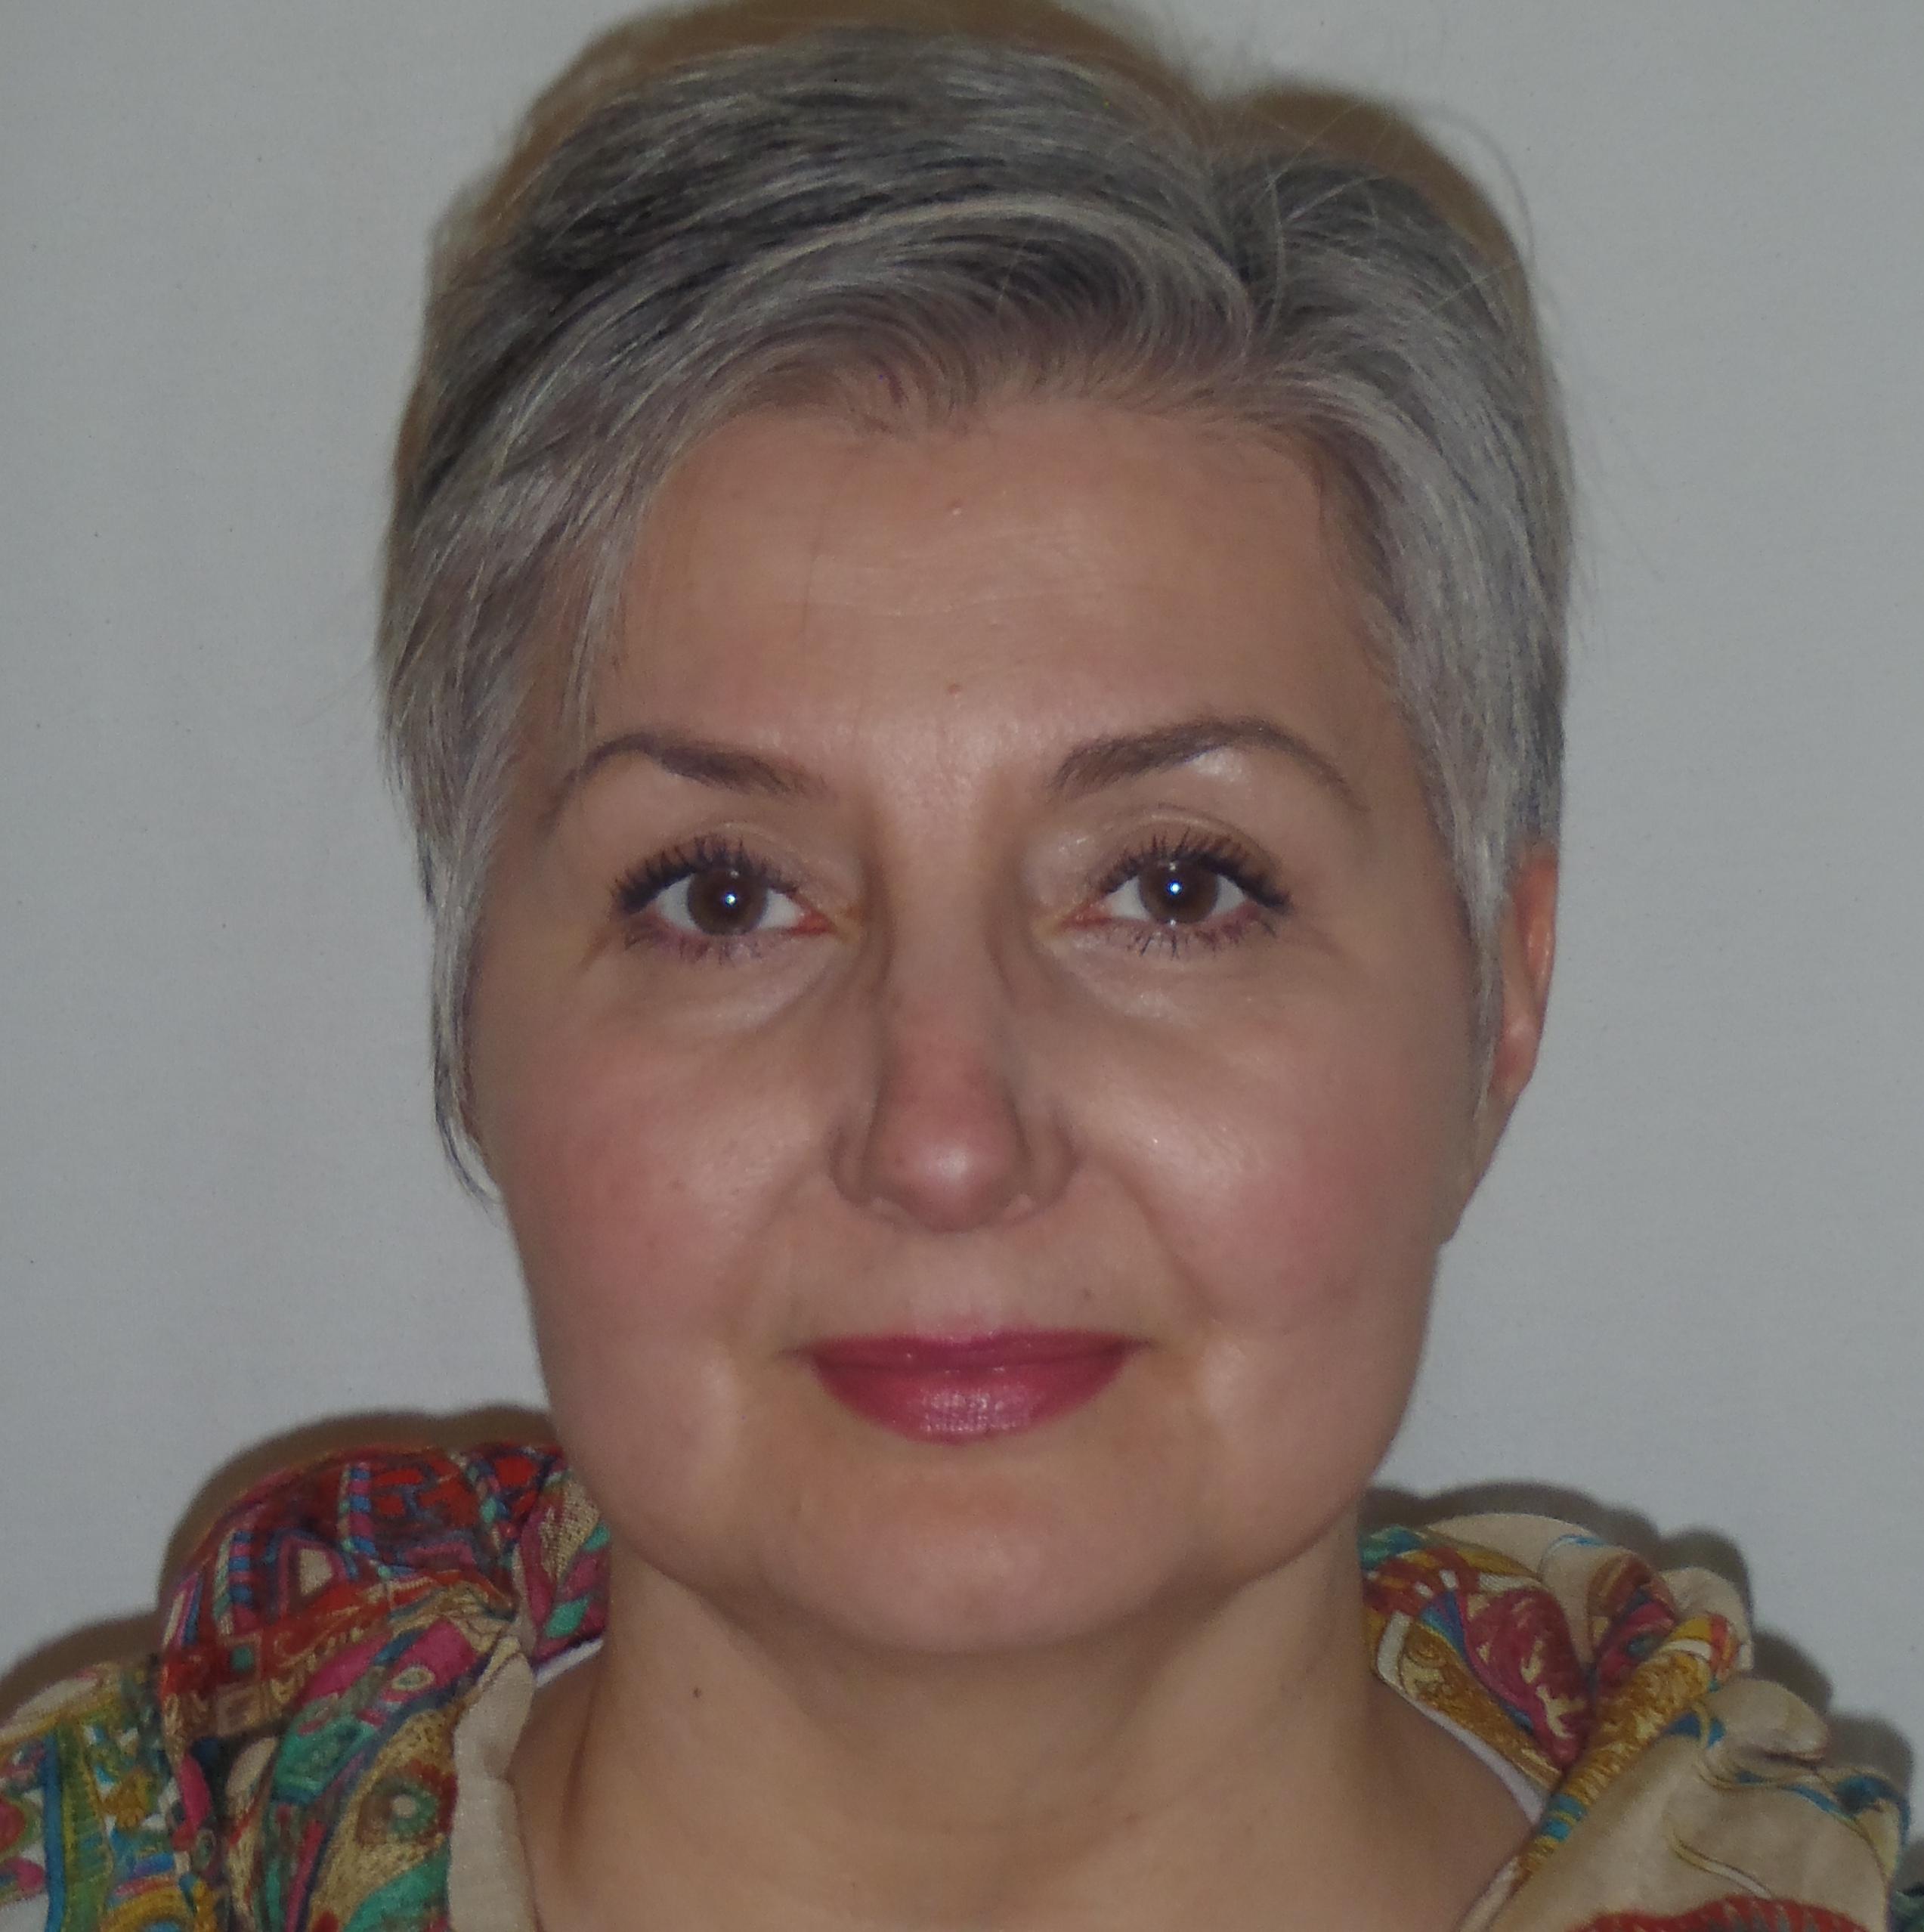 Slobadonka Hodzic